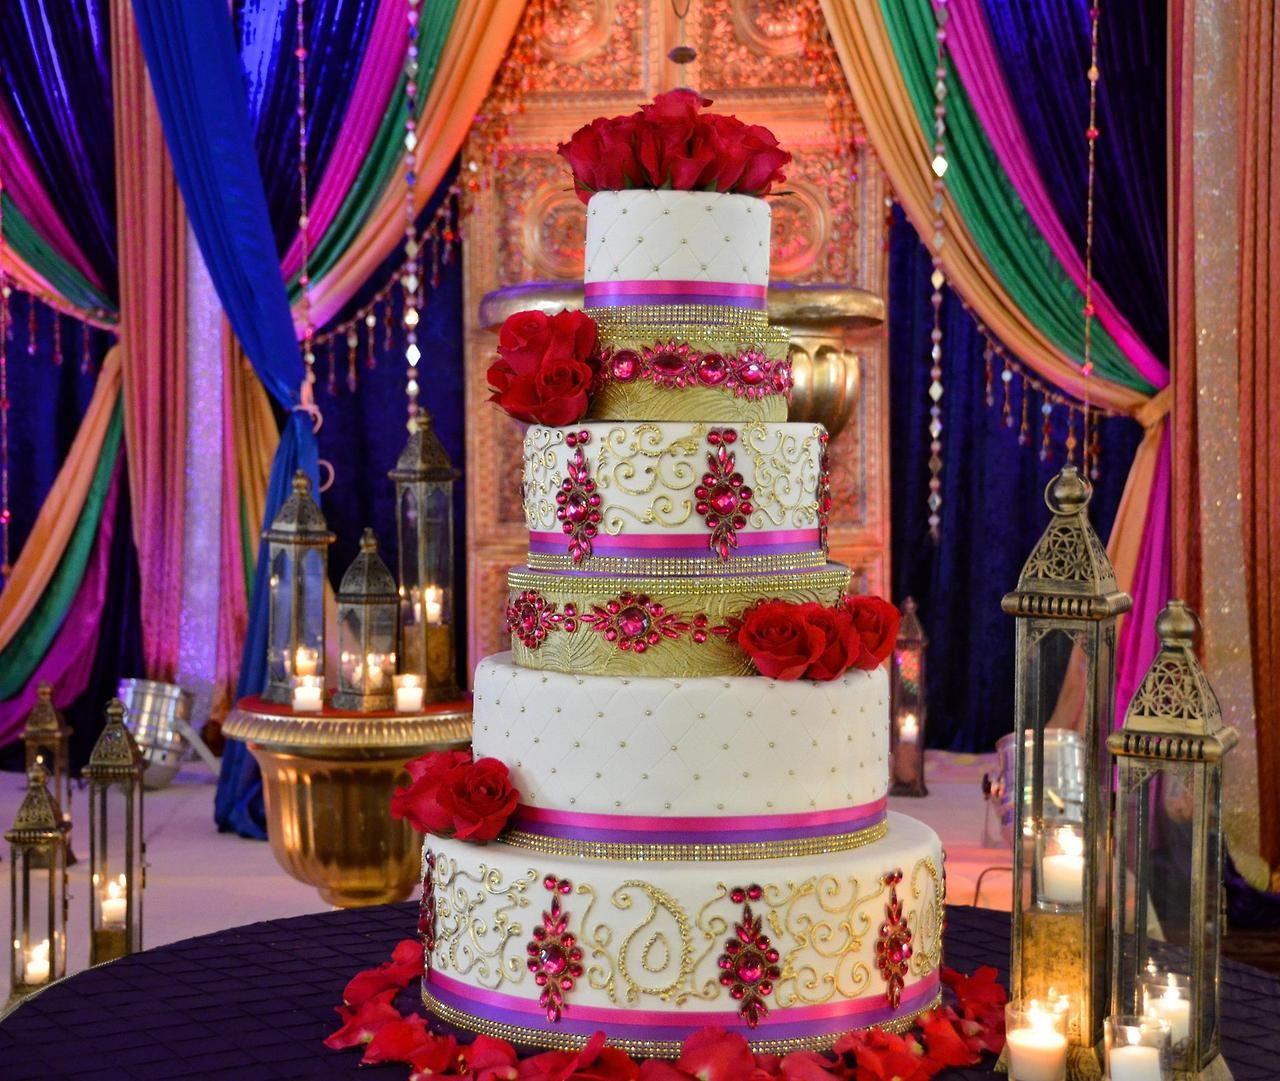 Indian Inspired Decorating Stunning Wedding Venue And Decor Indian Inspired Wedding Cake By